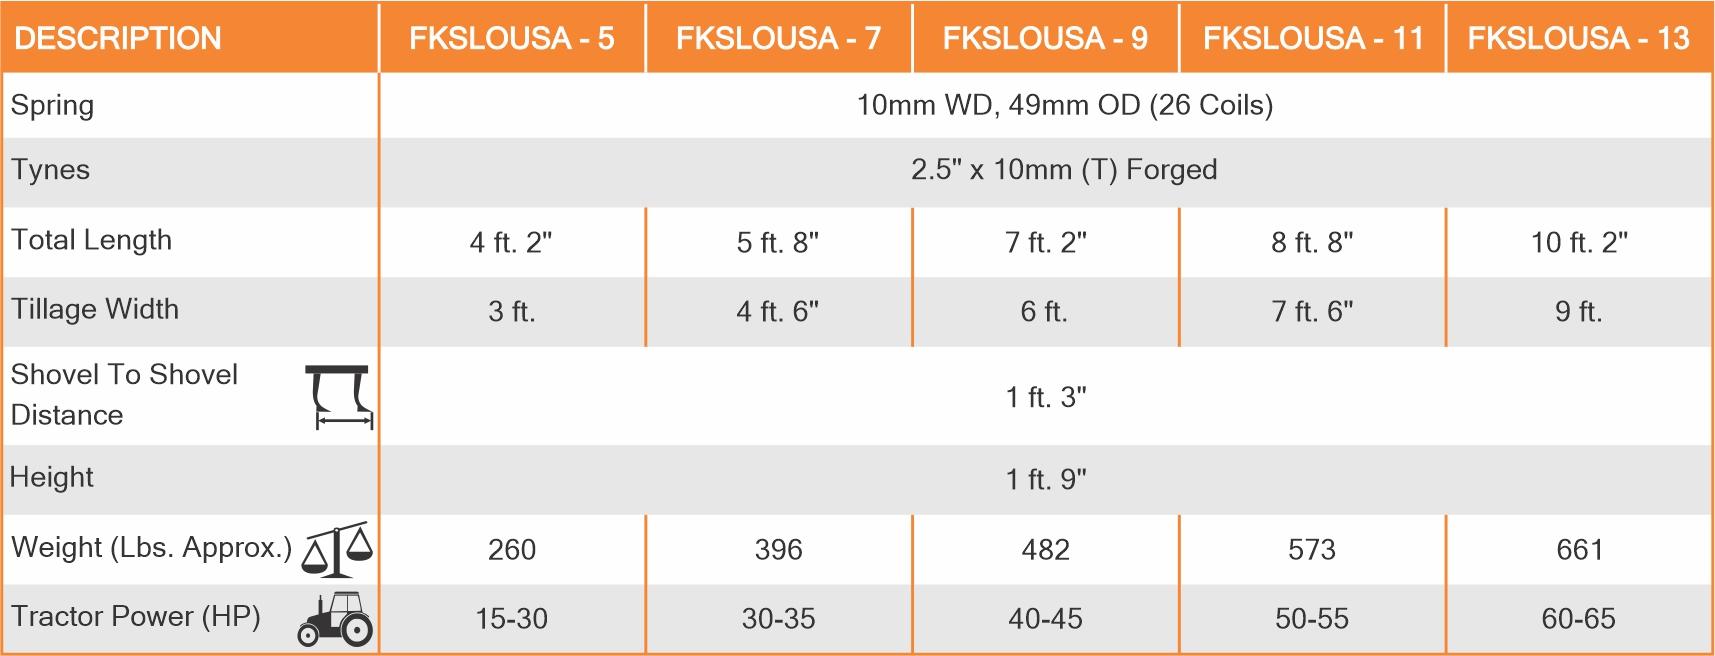 Spring Shank Cultivator-Medium Series Spectifications